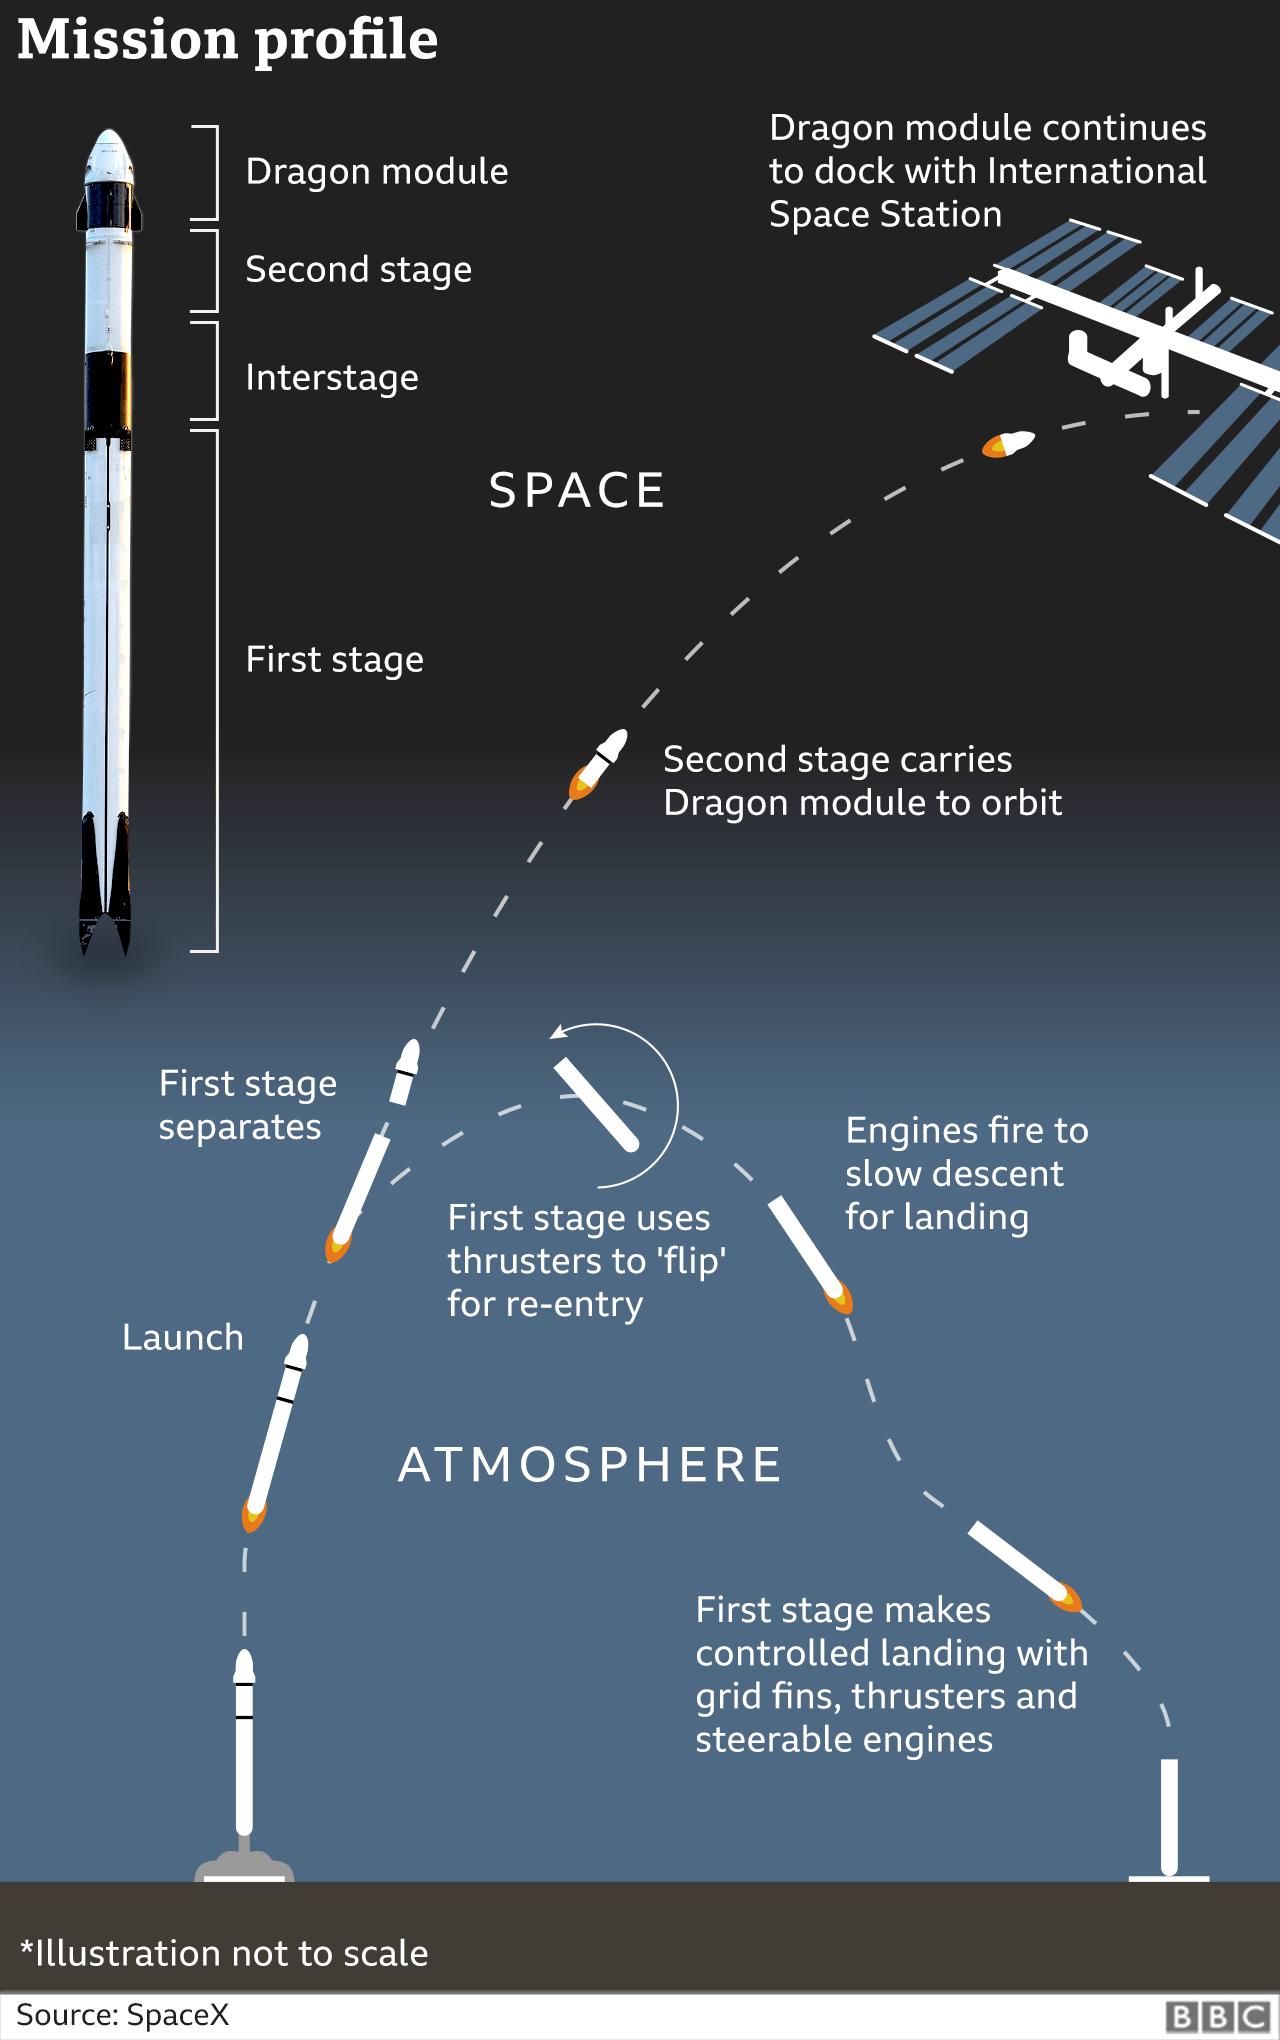 Mission profile